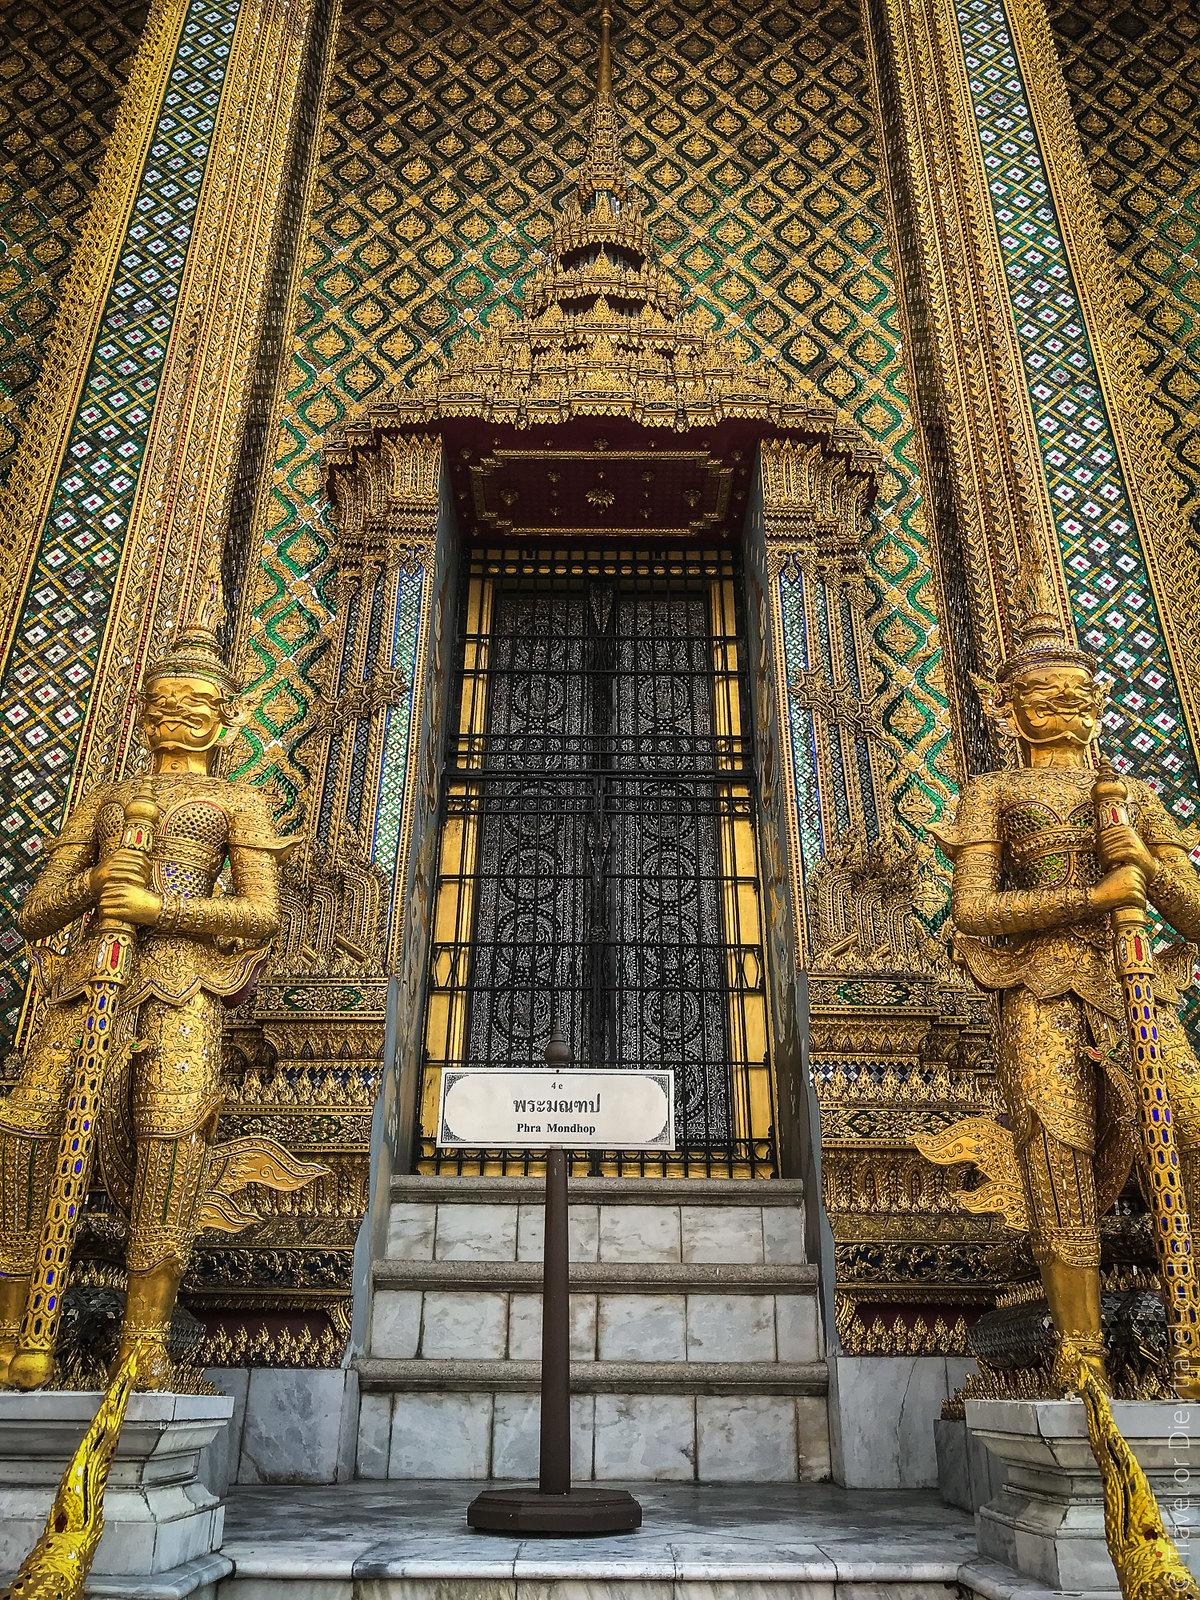 Grand-Palace-Bangkok-Королевский-дворец-Бангкок-9182